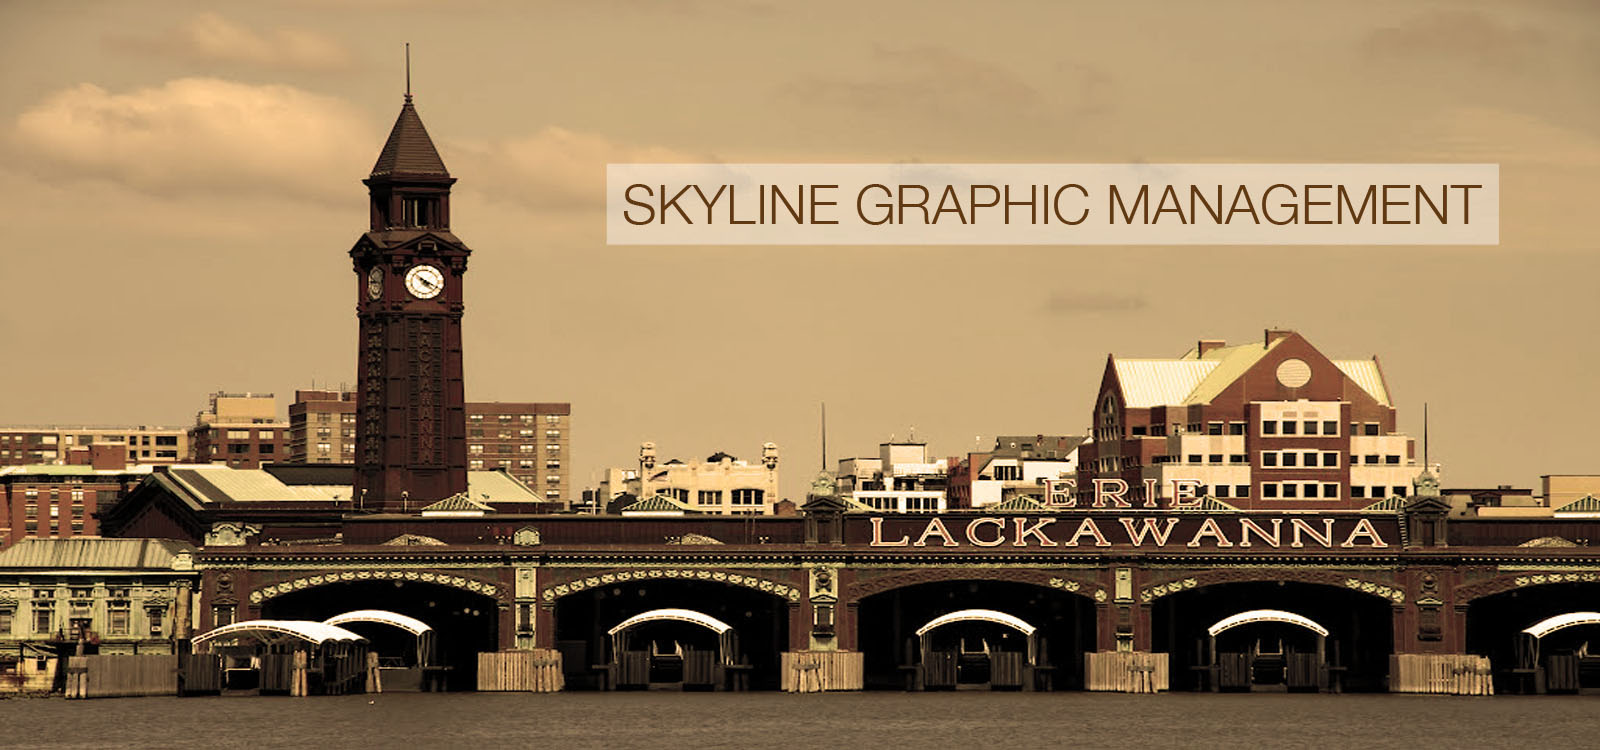 Skyline Graphic Management